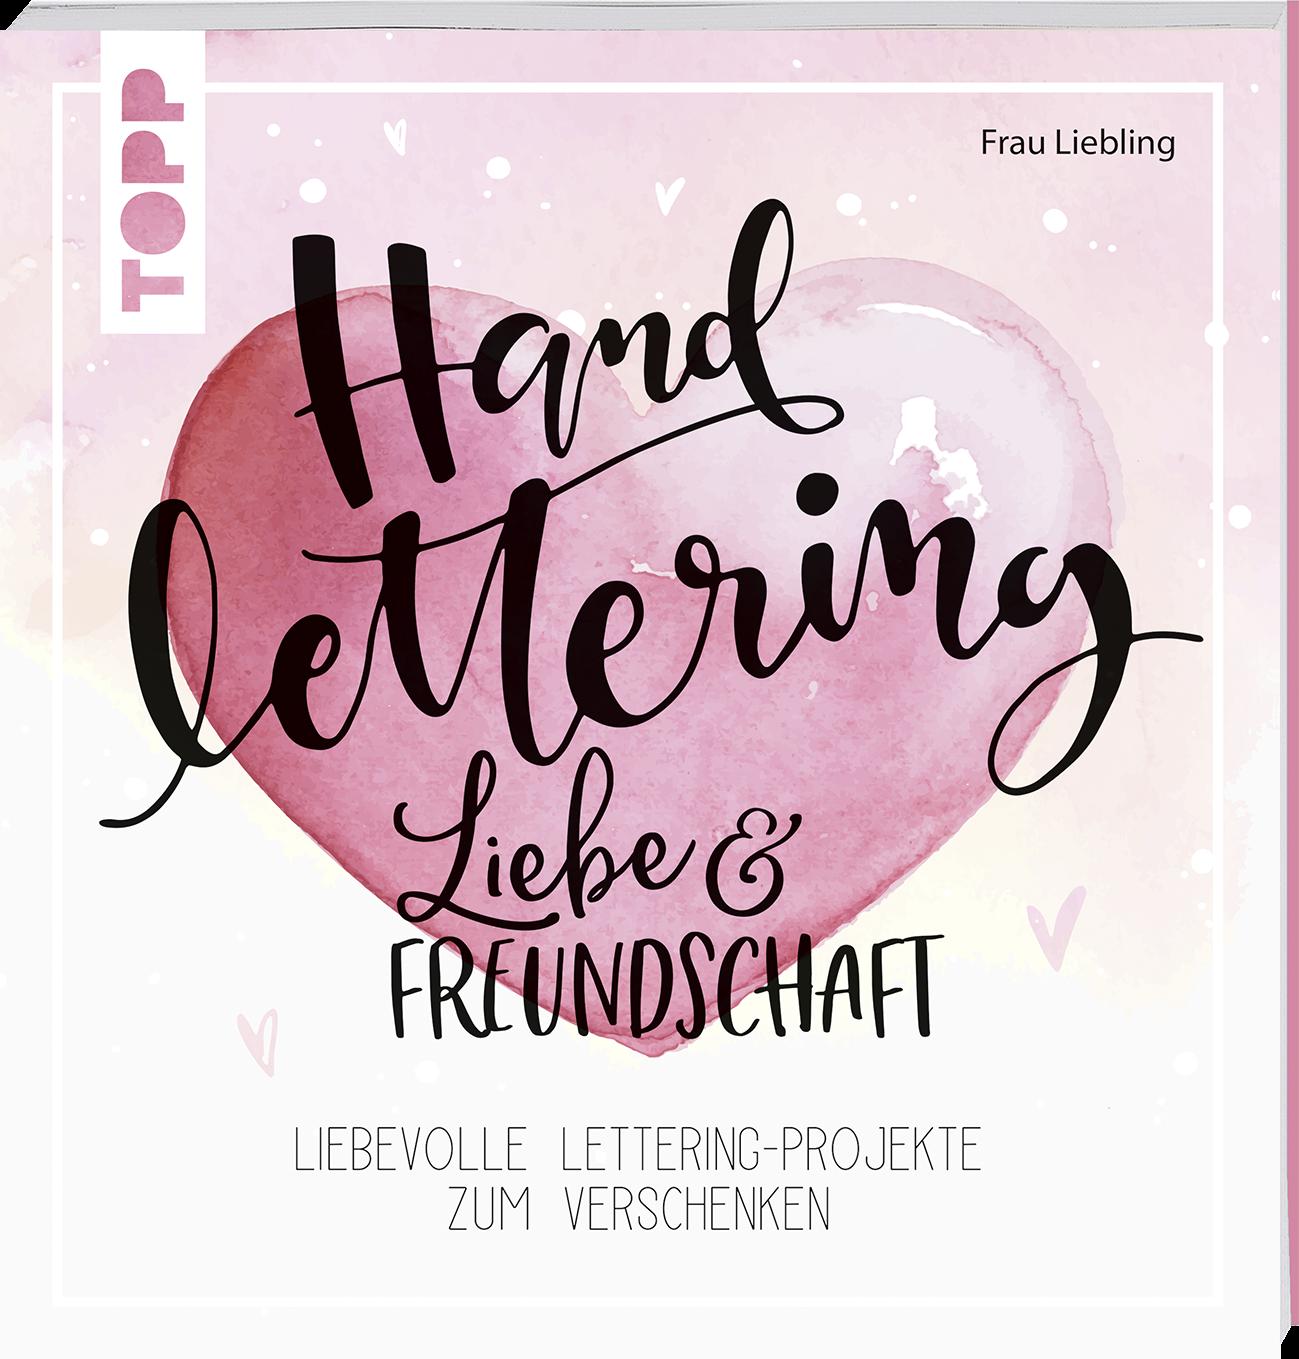 Handlettering Liebe Freundschaft Von Frau Frau Liebling